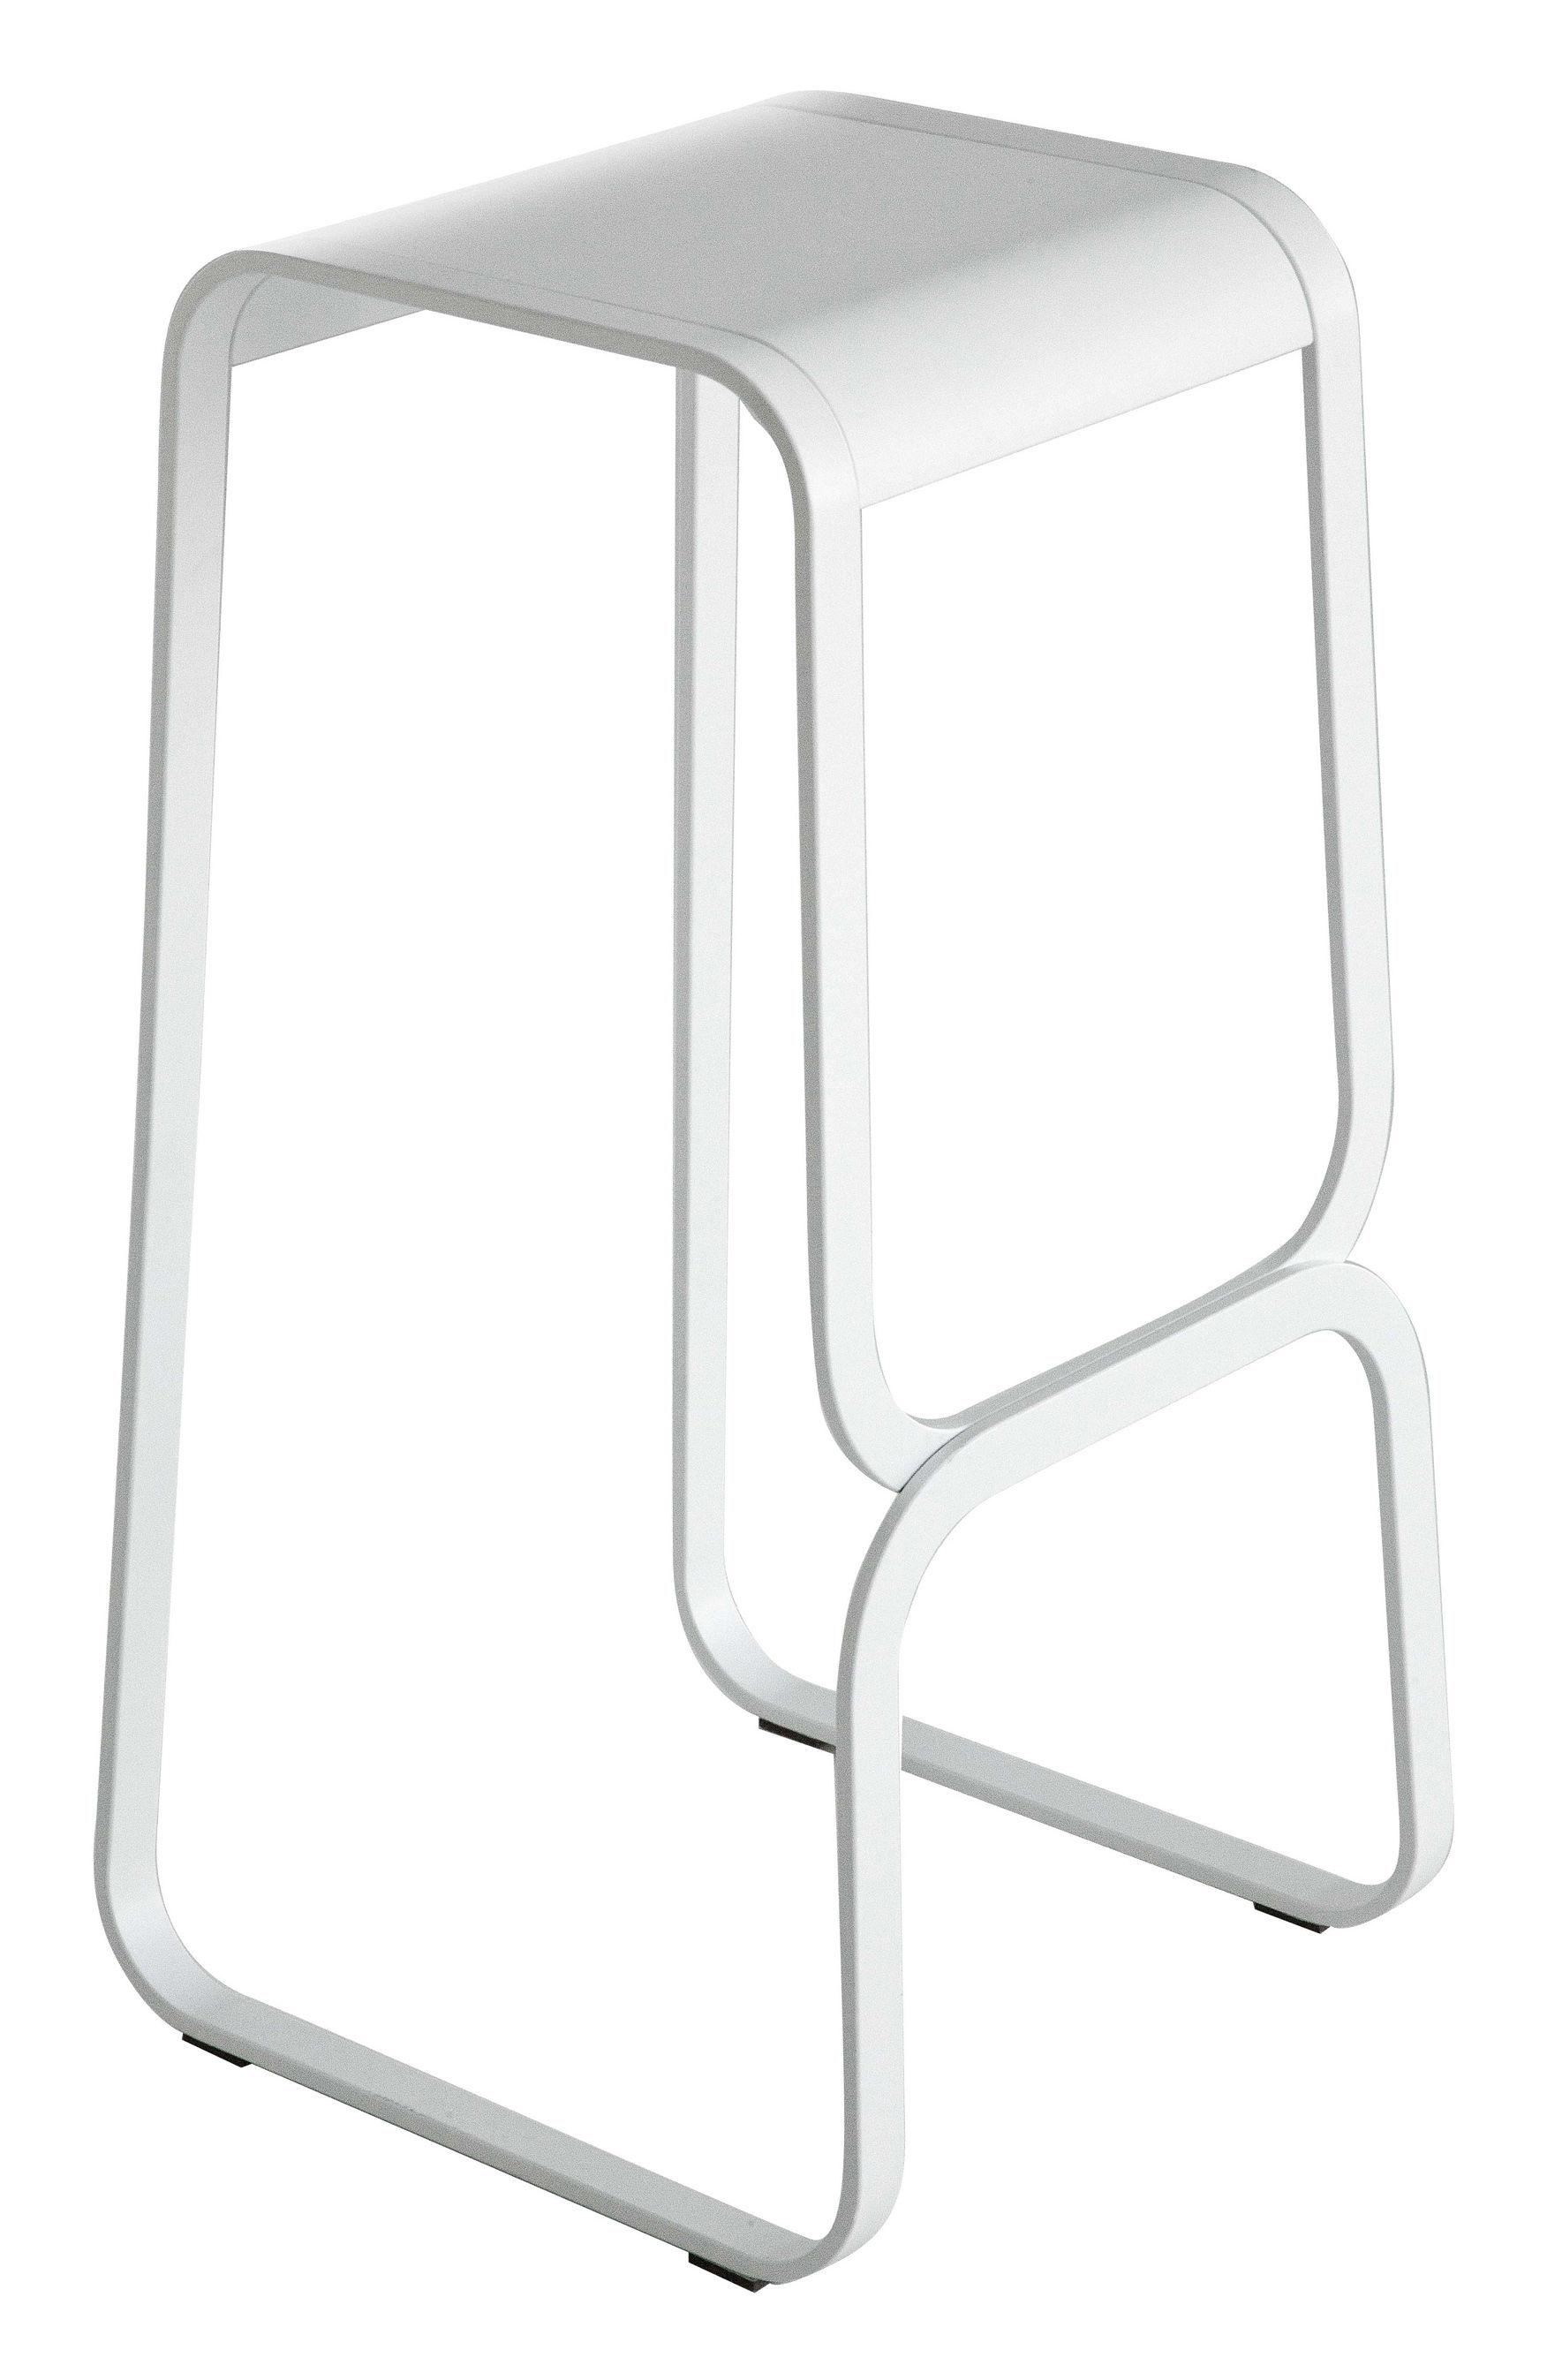 Möbel - Barhocker - Continuum Barhocker / Holz & Metall - H 80 cm - Lapalma - Sitzfläche: weiß / Gestell: weiß - Multiplis de bois teinté, rostfreier lackierter Stahl